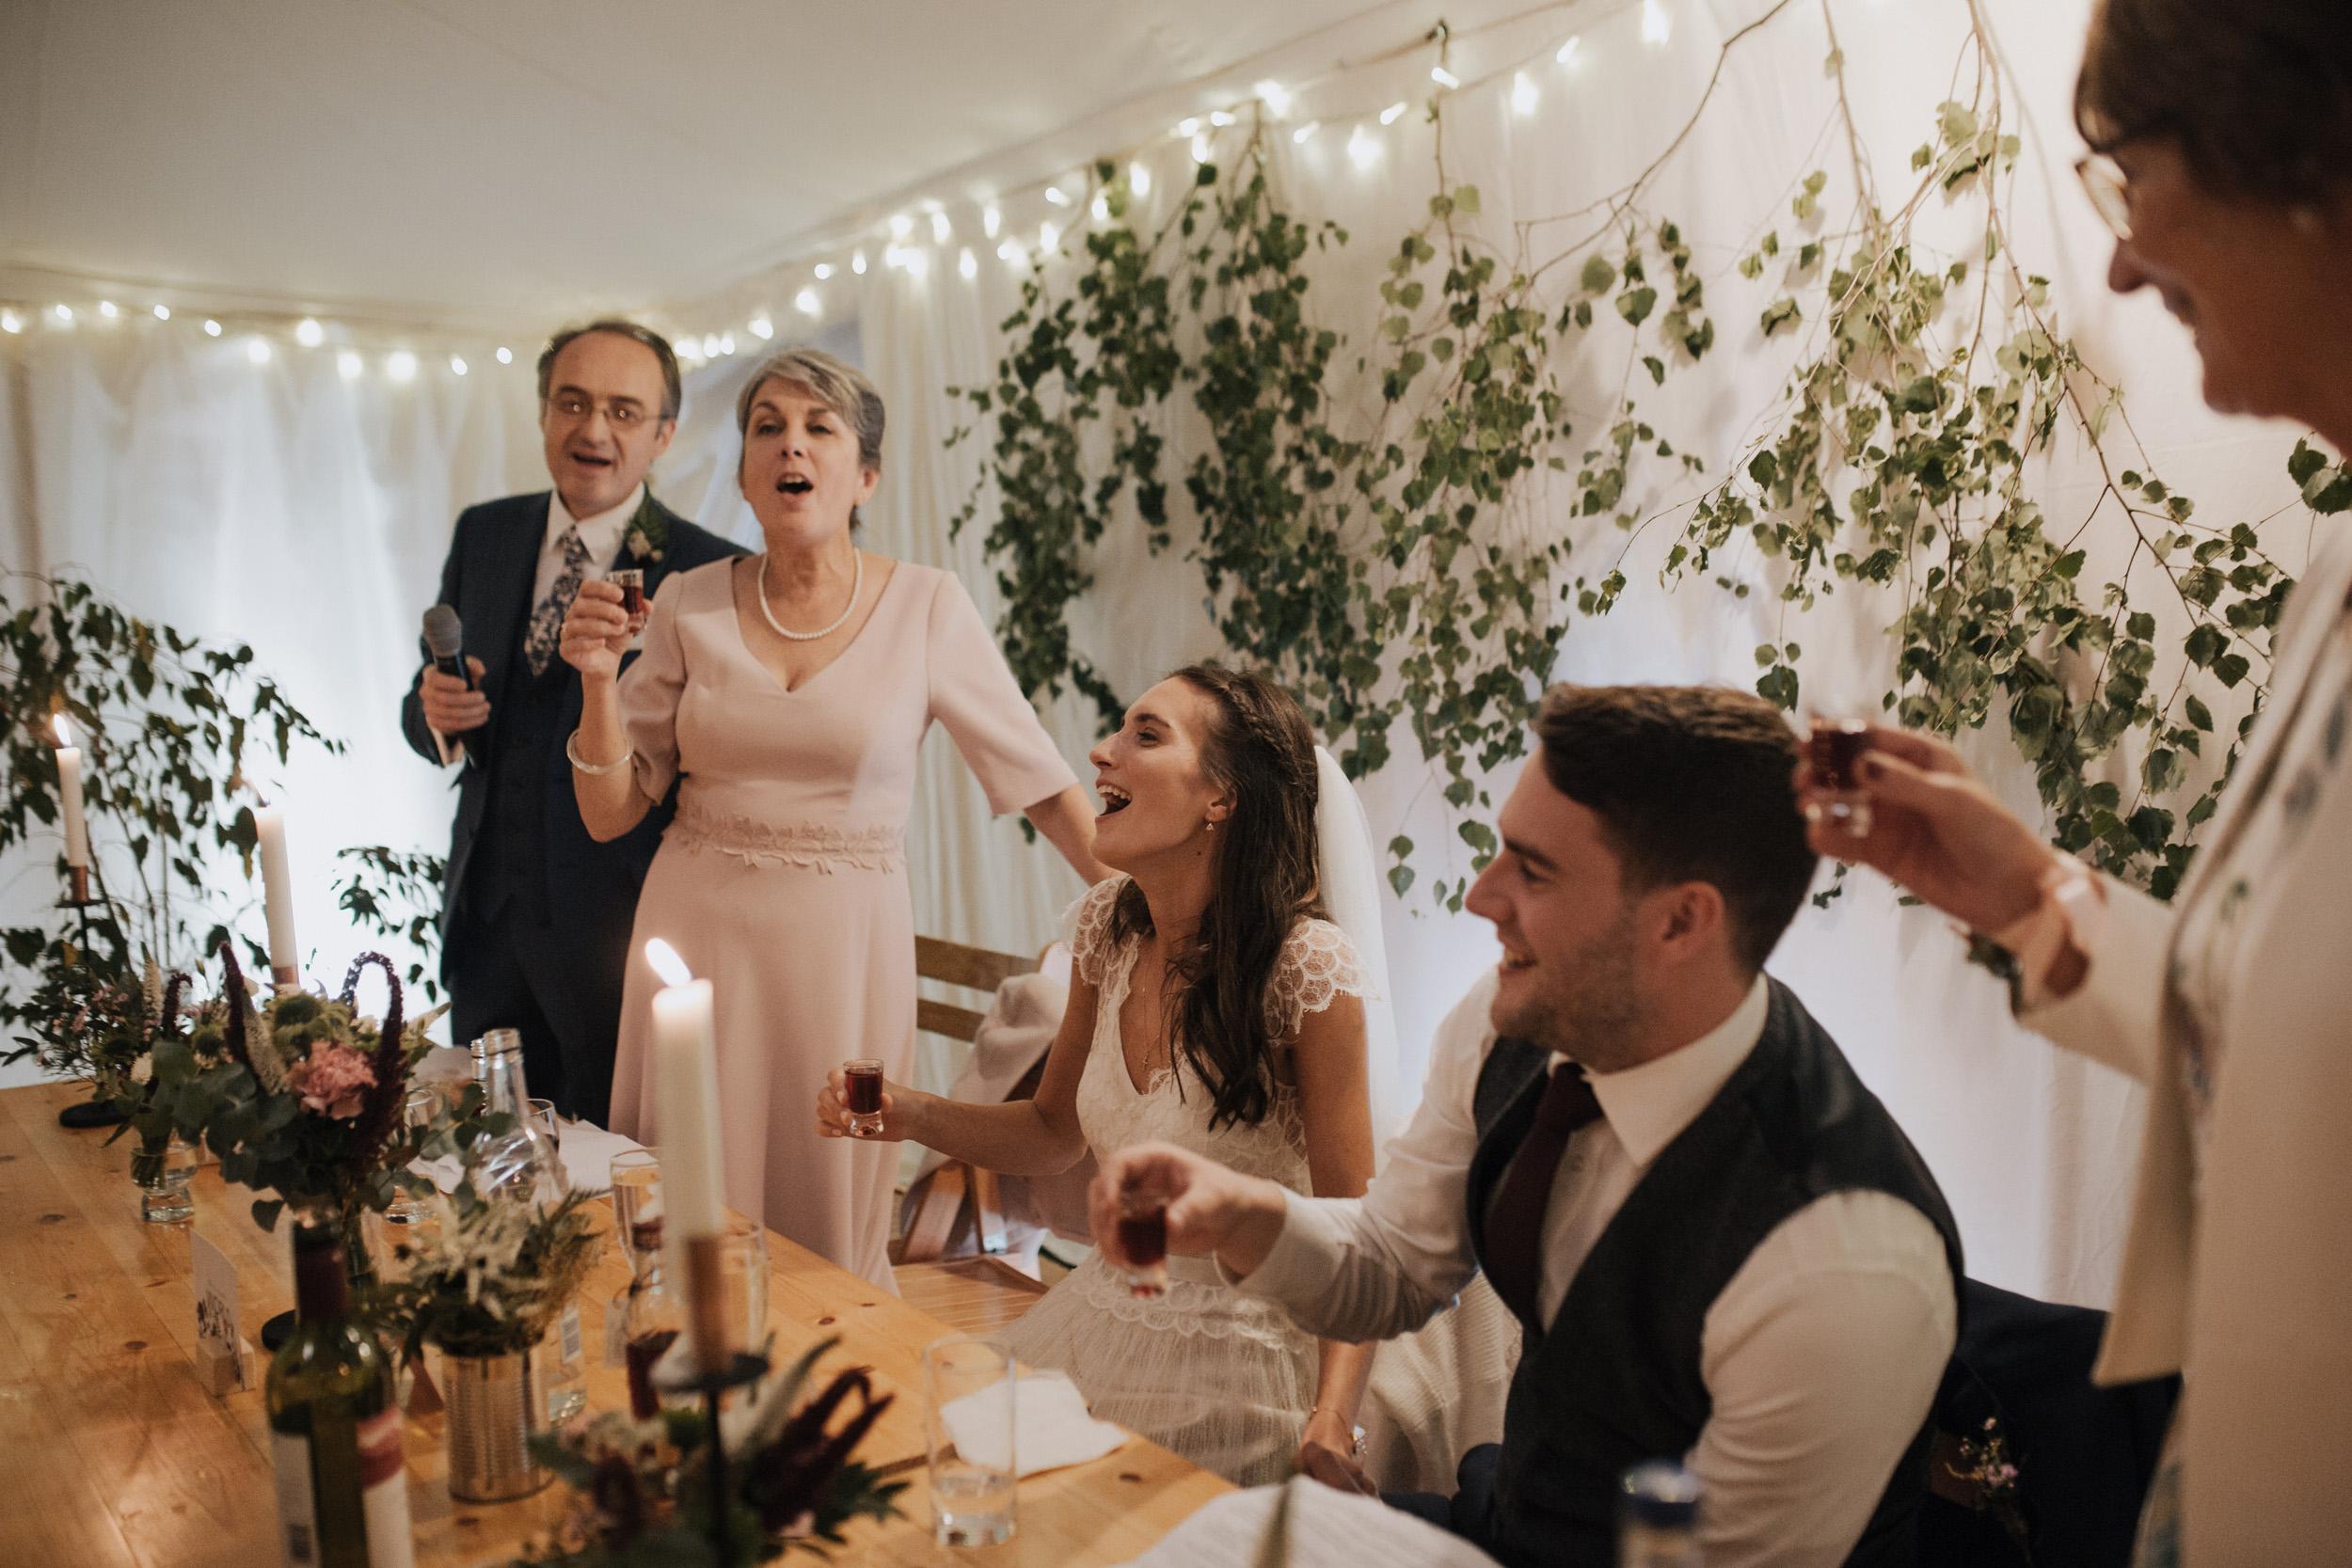 Joasia-Kate-Beaumont-Bohemian-Lace-Wedding-Dress-Peak-District-Sheffield-Wedding-55.jpg